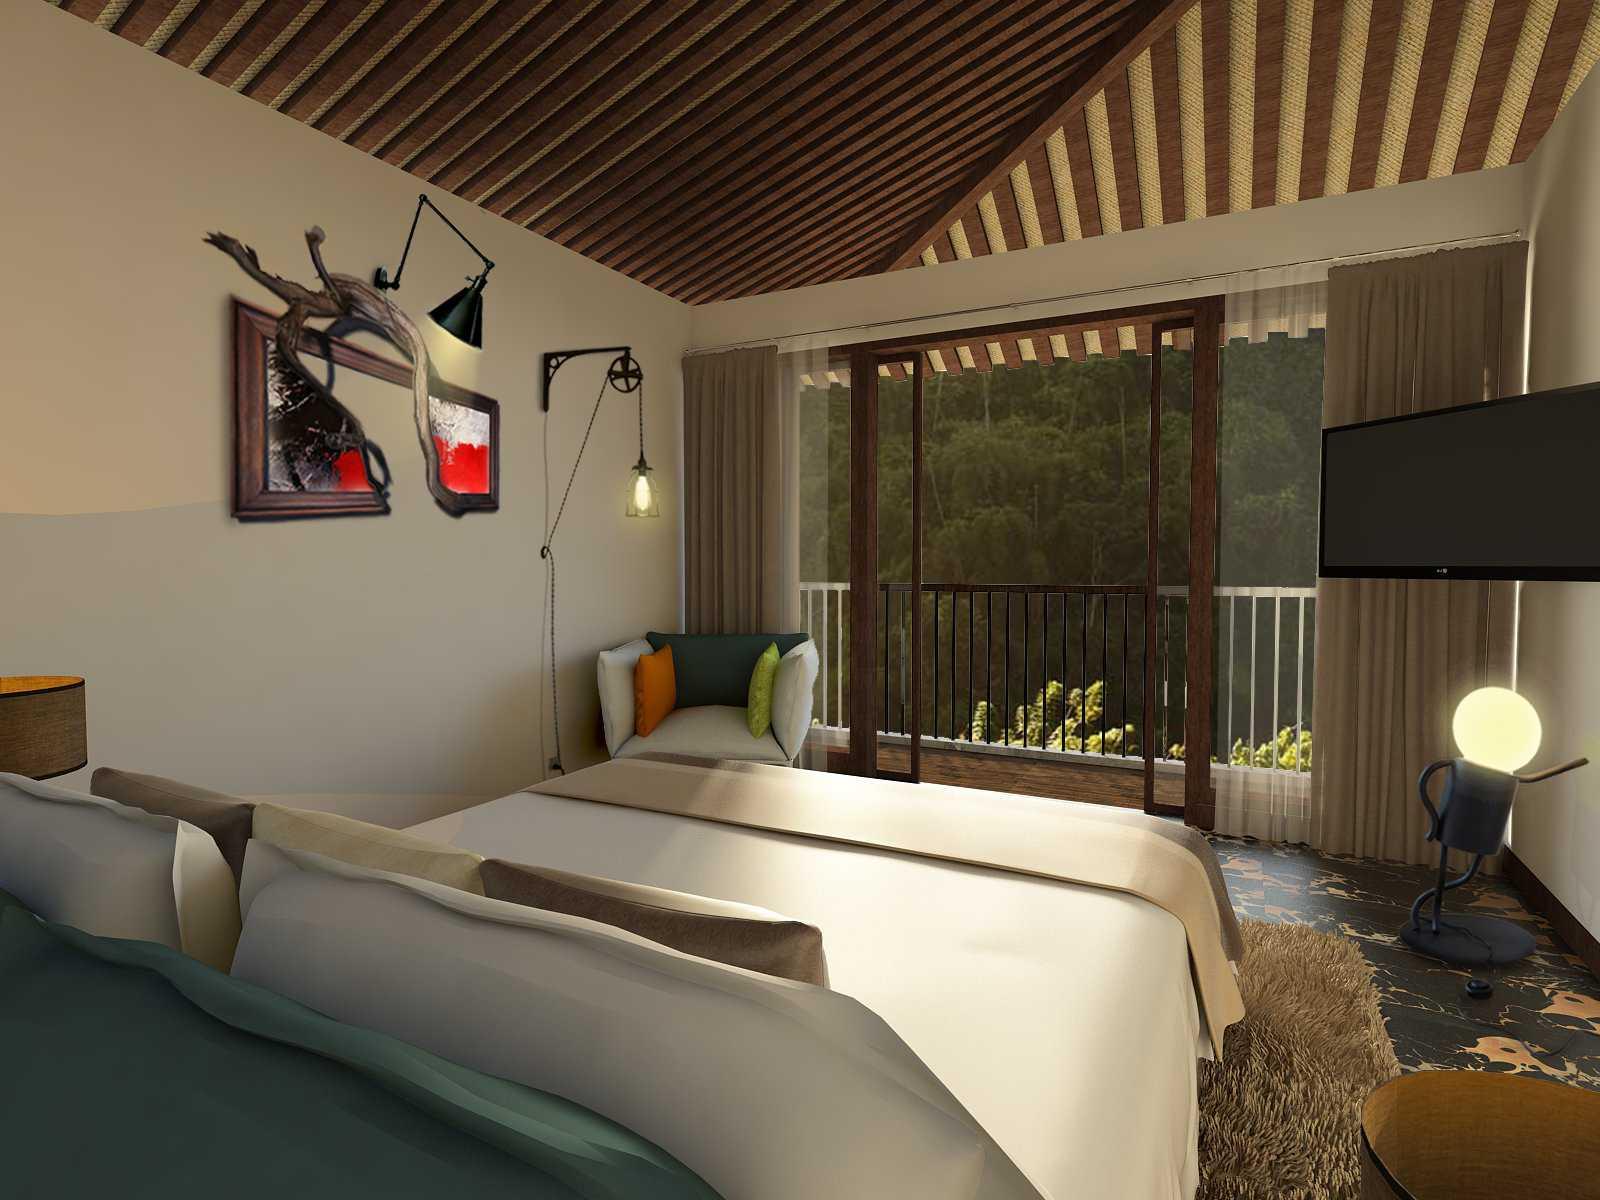 Ksad Dukuh Artvilla Ubud, Bali, Indonesia Ubud, Bali, Indonesia Bedroom Tropis  10228